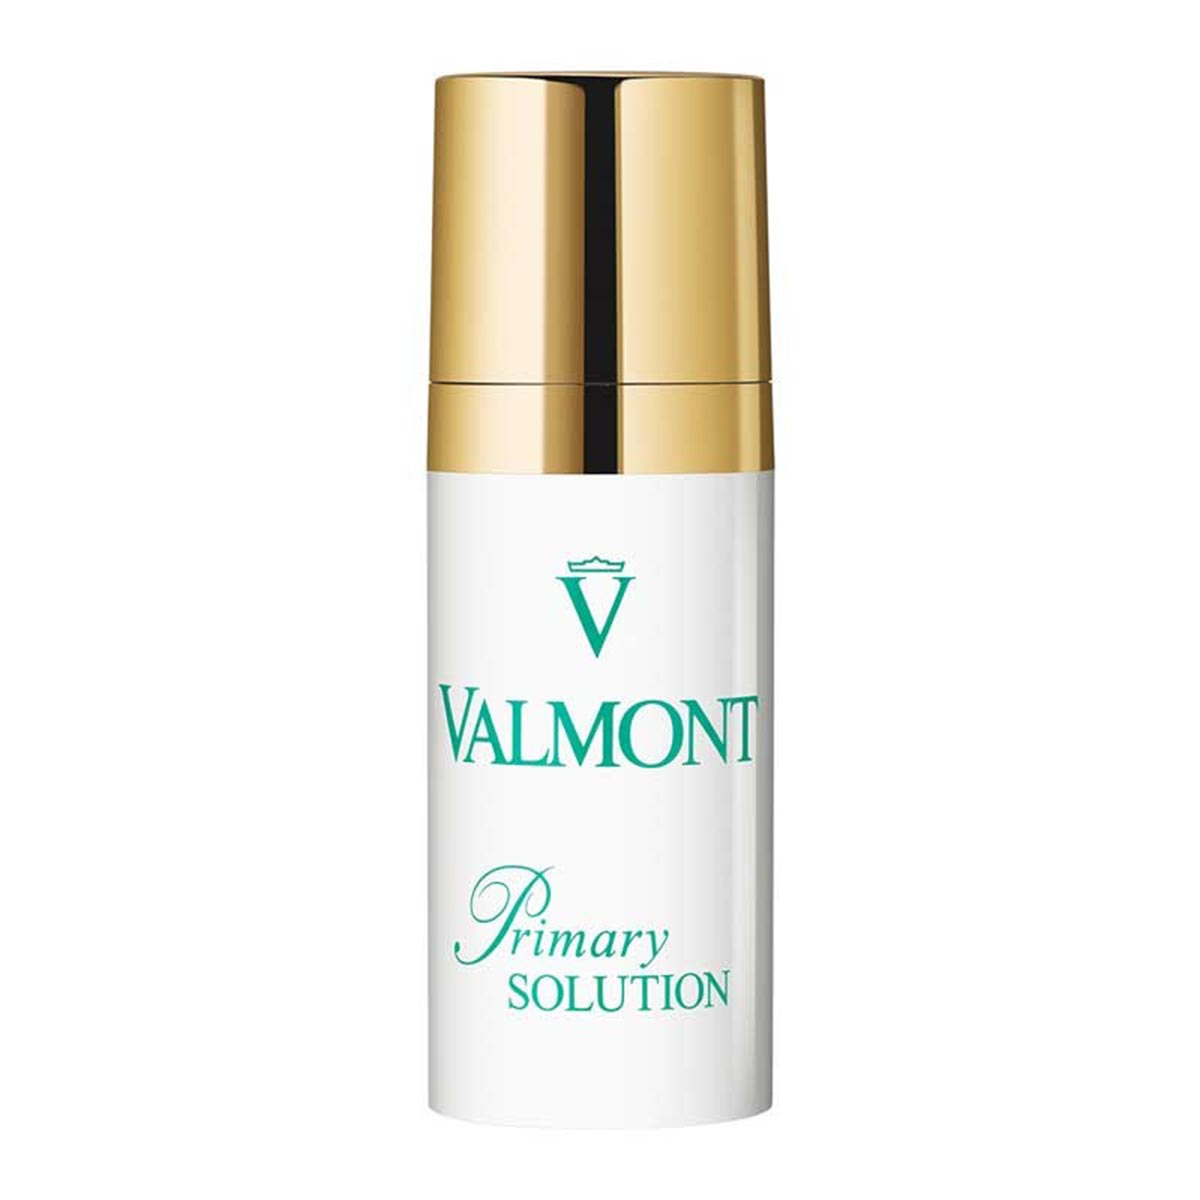 Valmont primary solution 20ml - BellezaMagica.com